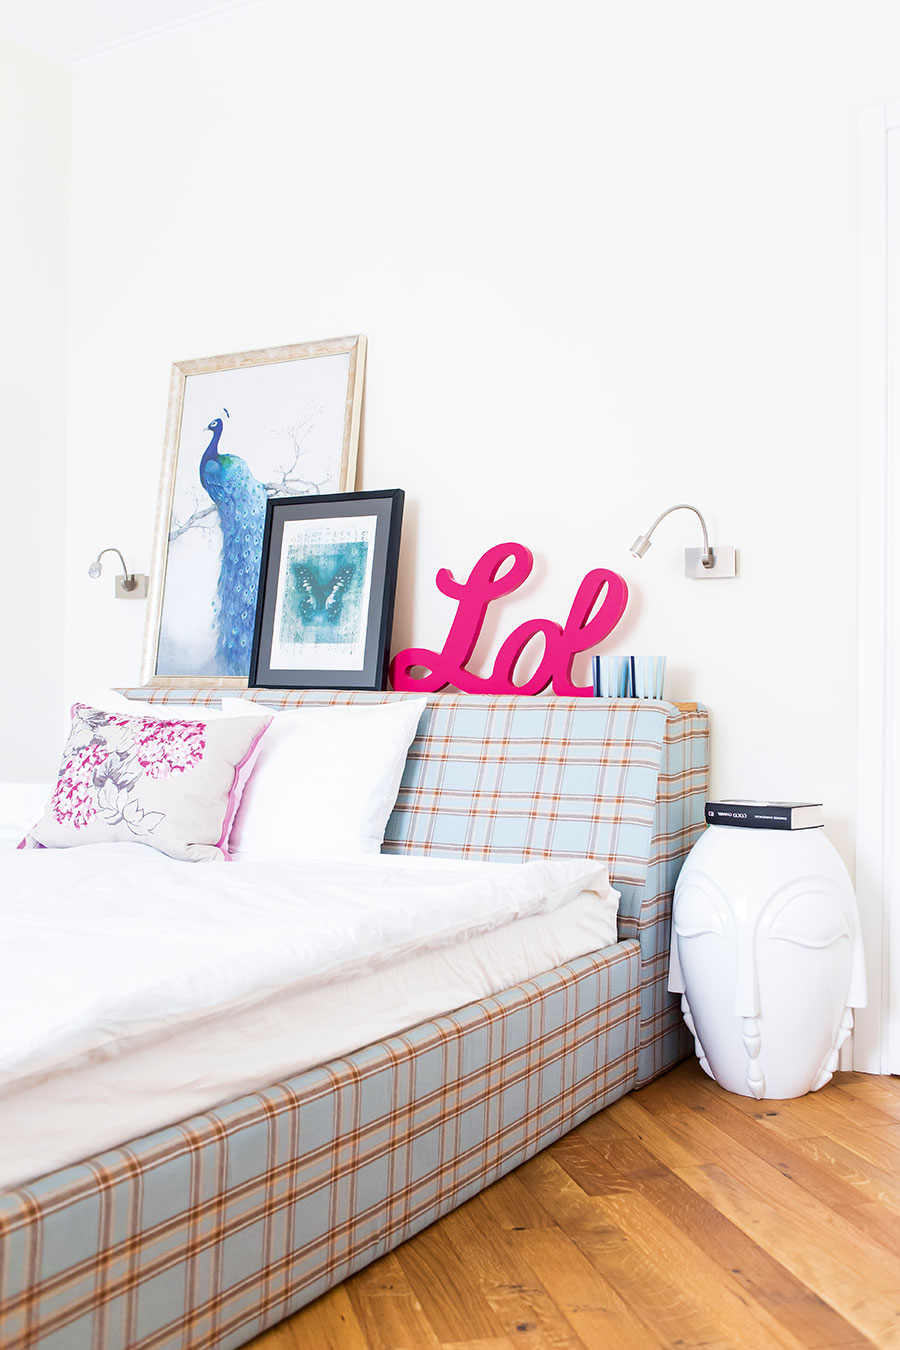 Un dormitor luminos cu accente de culoare